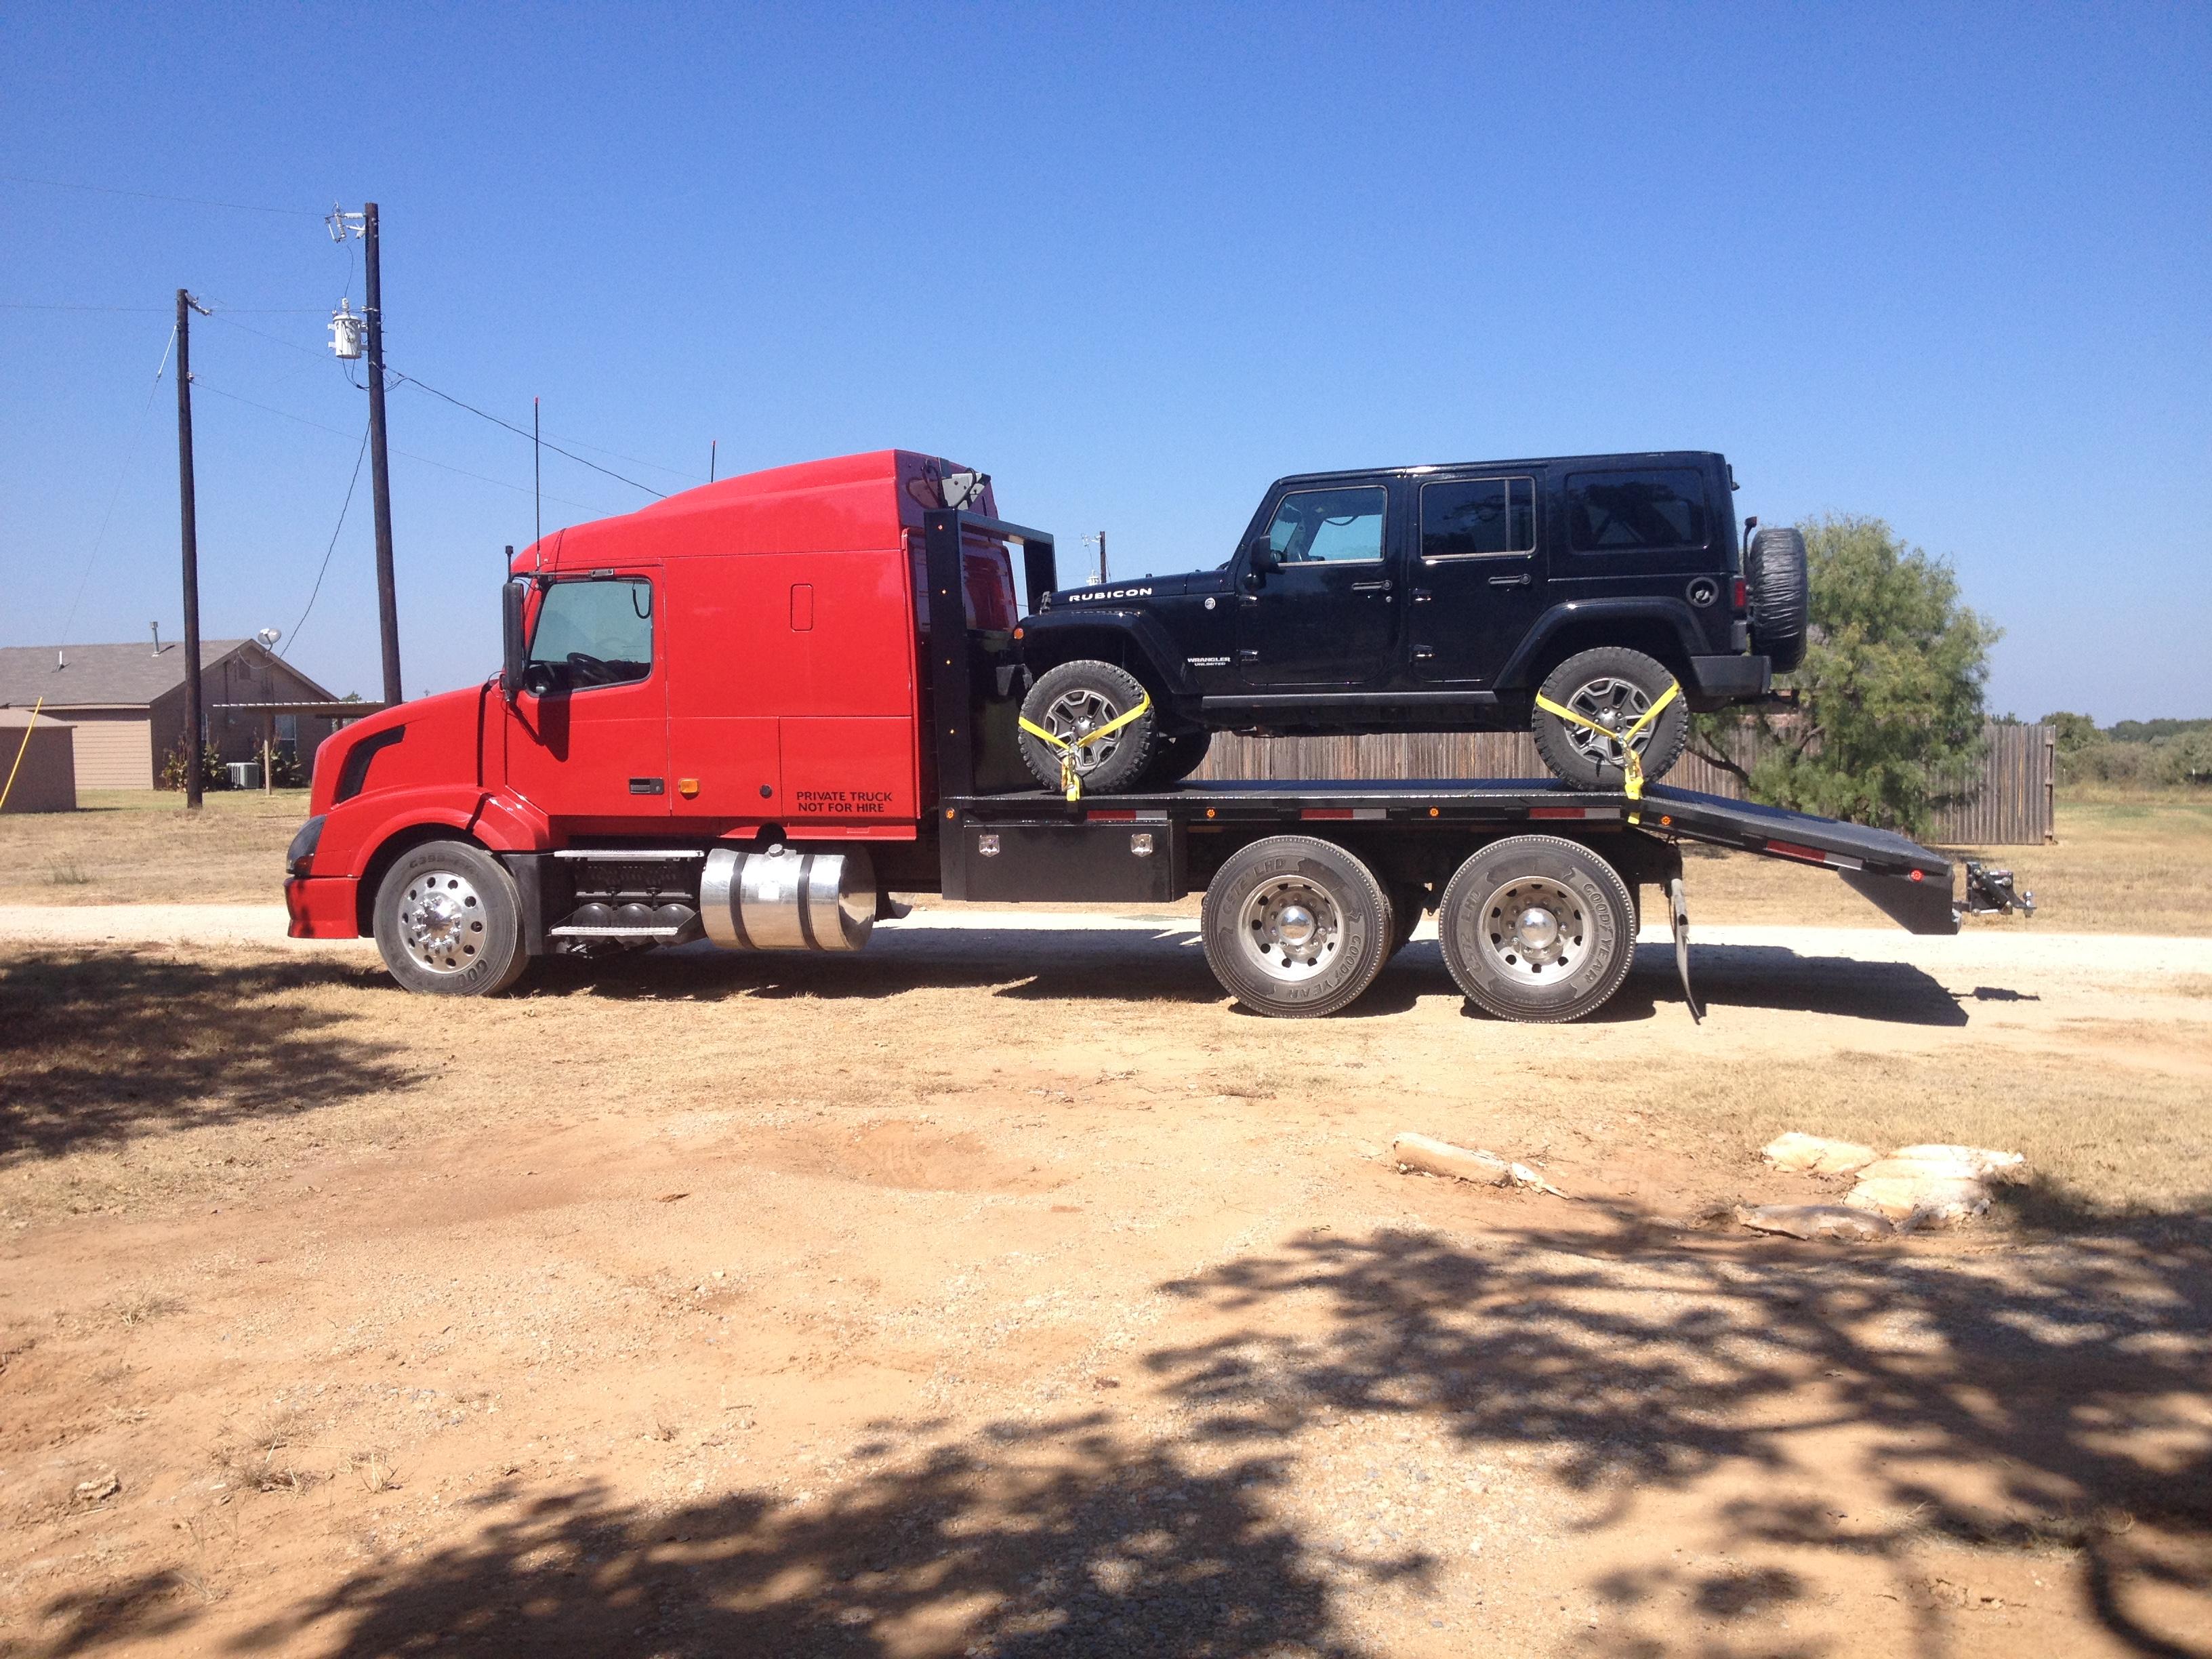 Texas Rv Toy Hauler Conversions Texas Dually By Texas Rv Toy Hauler Conversions